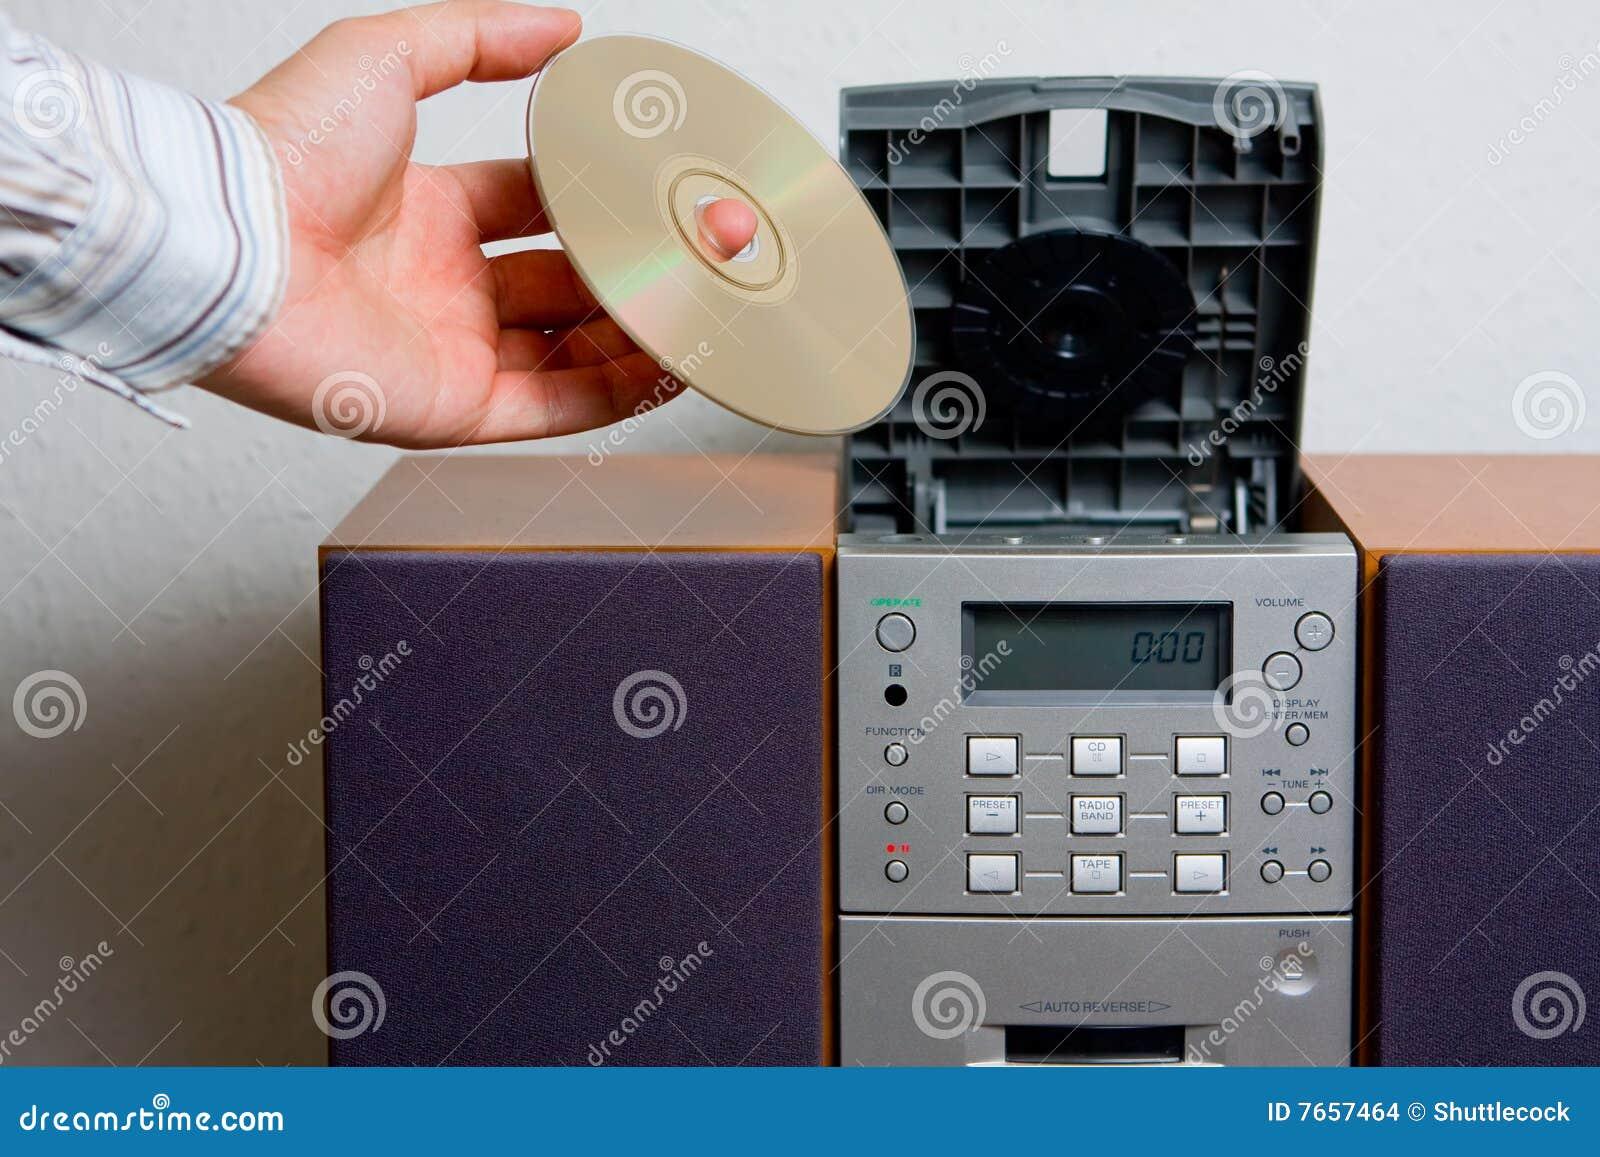 CD player music entertainment